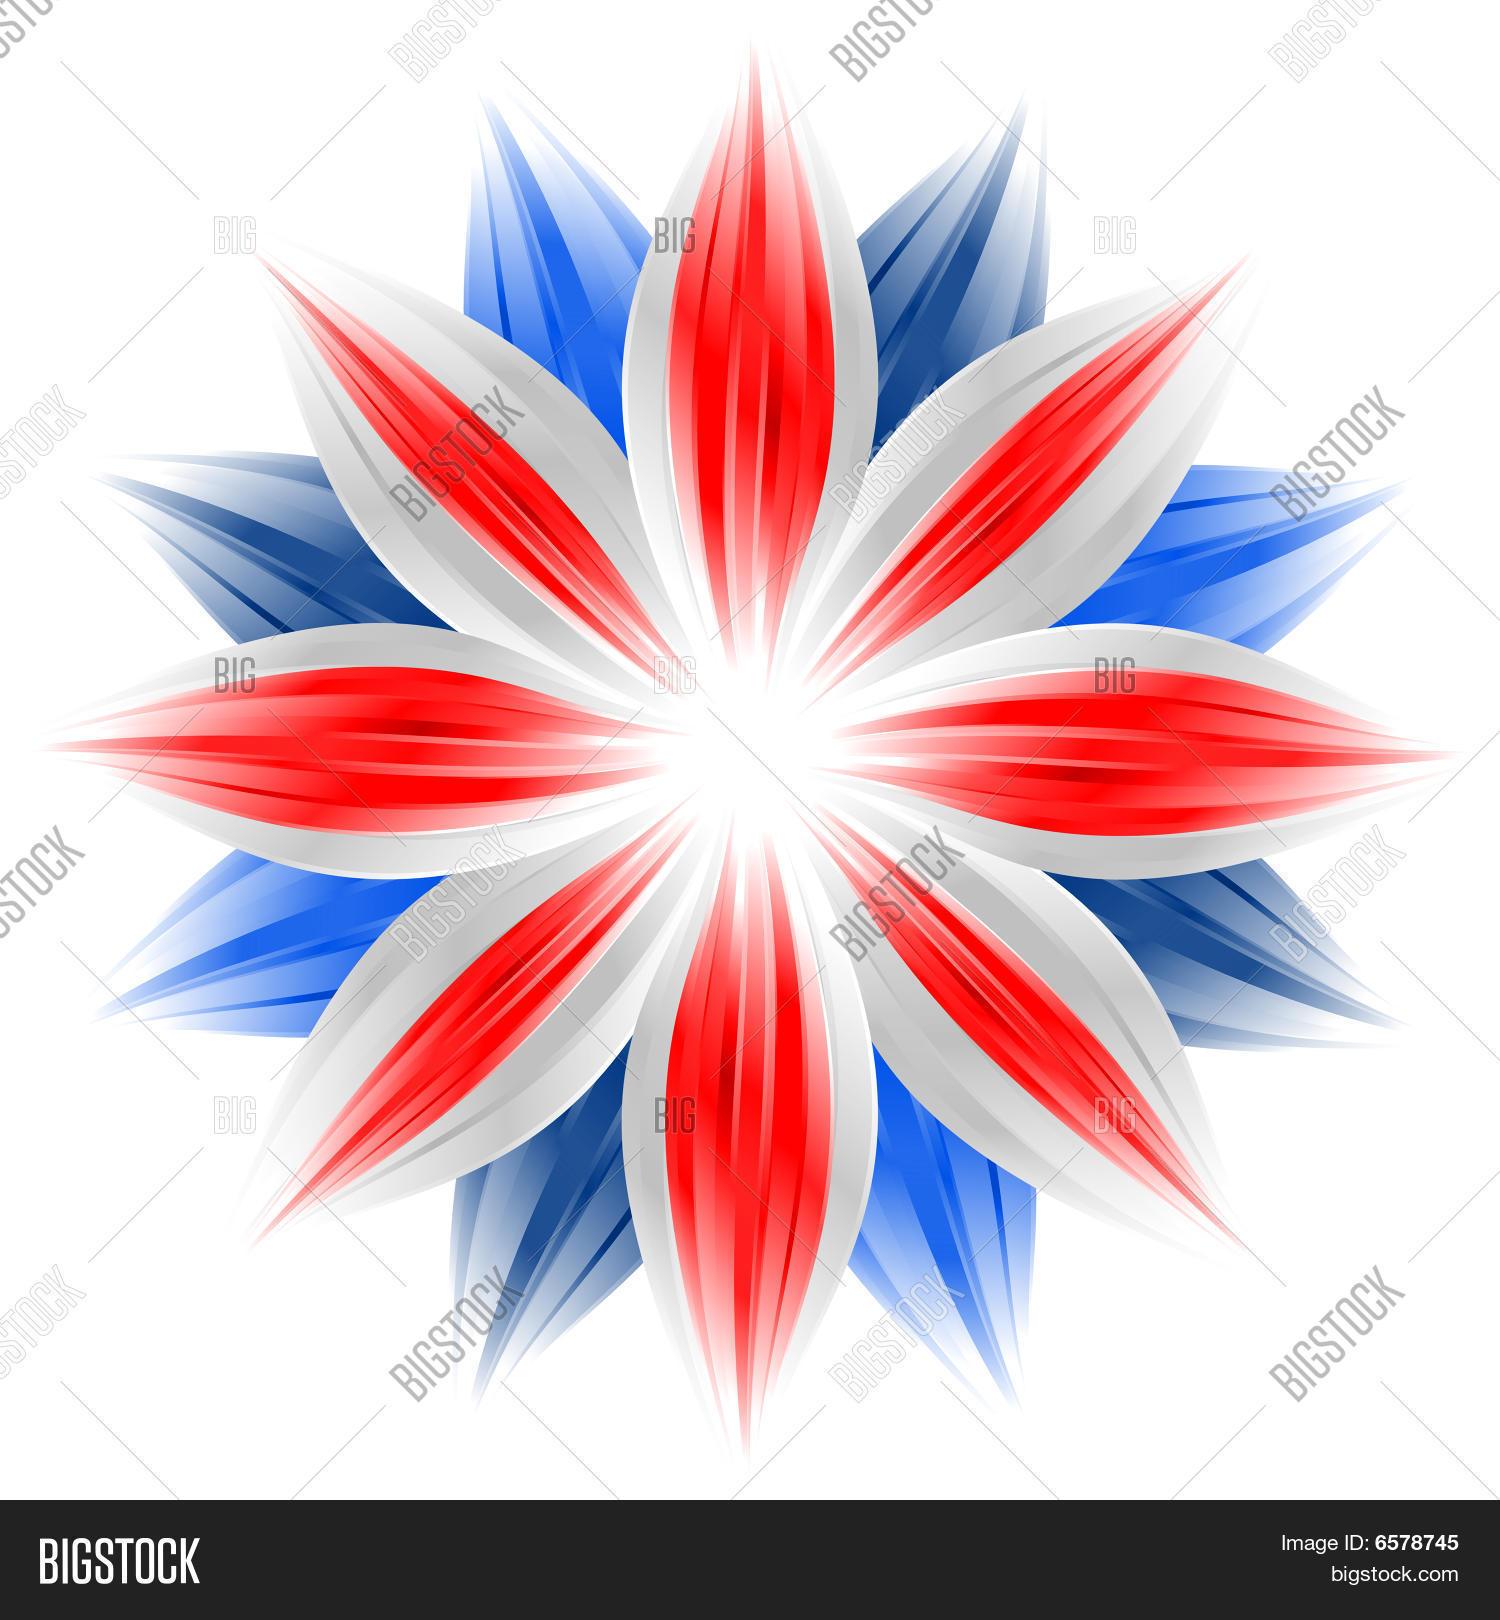 Flower British Flag Image Photo Free Trial Bigstock